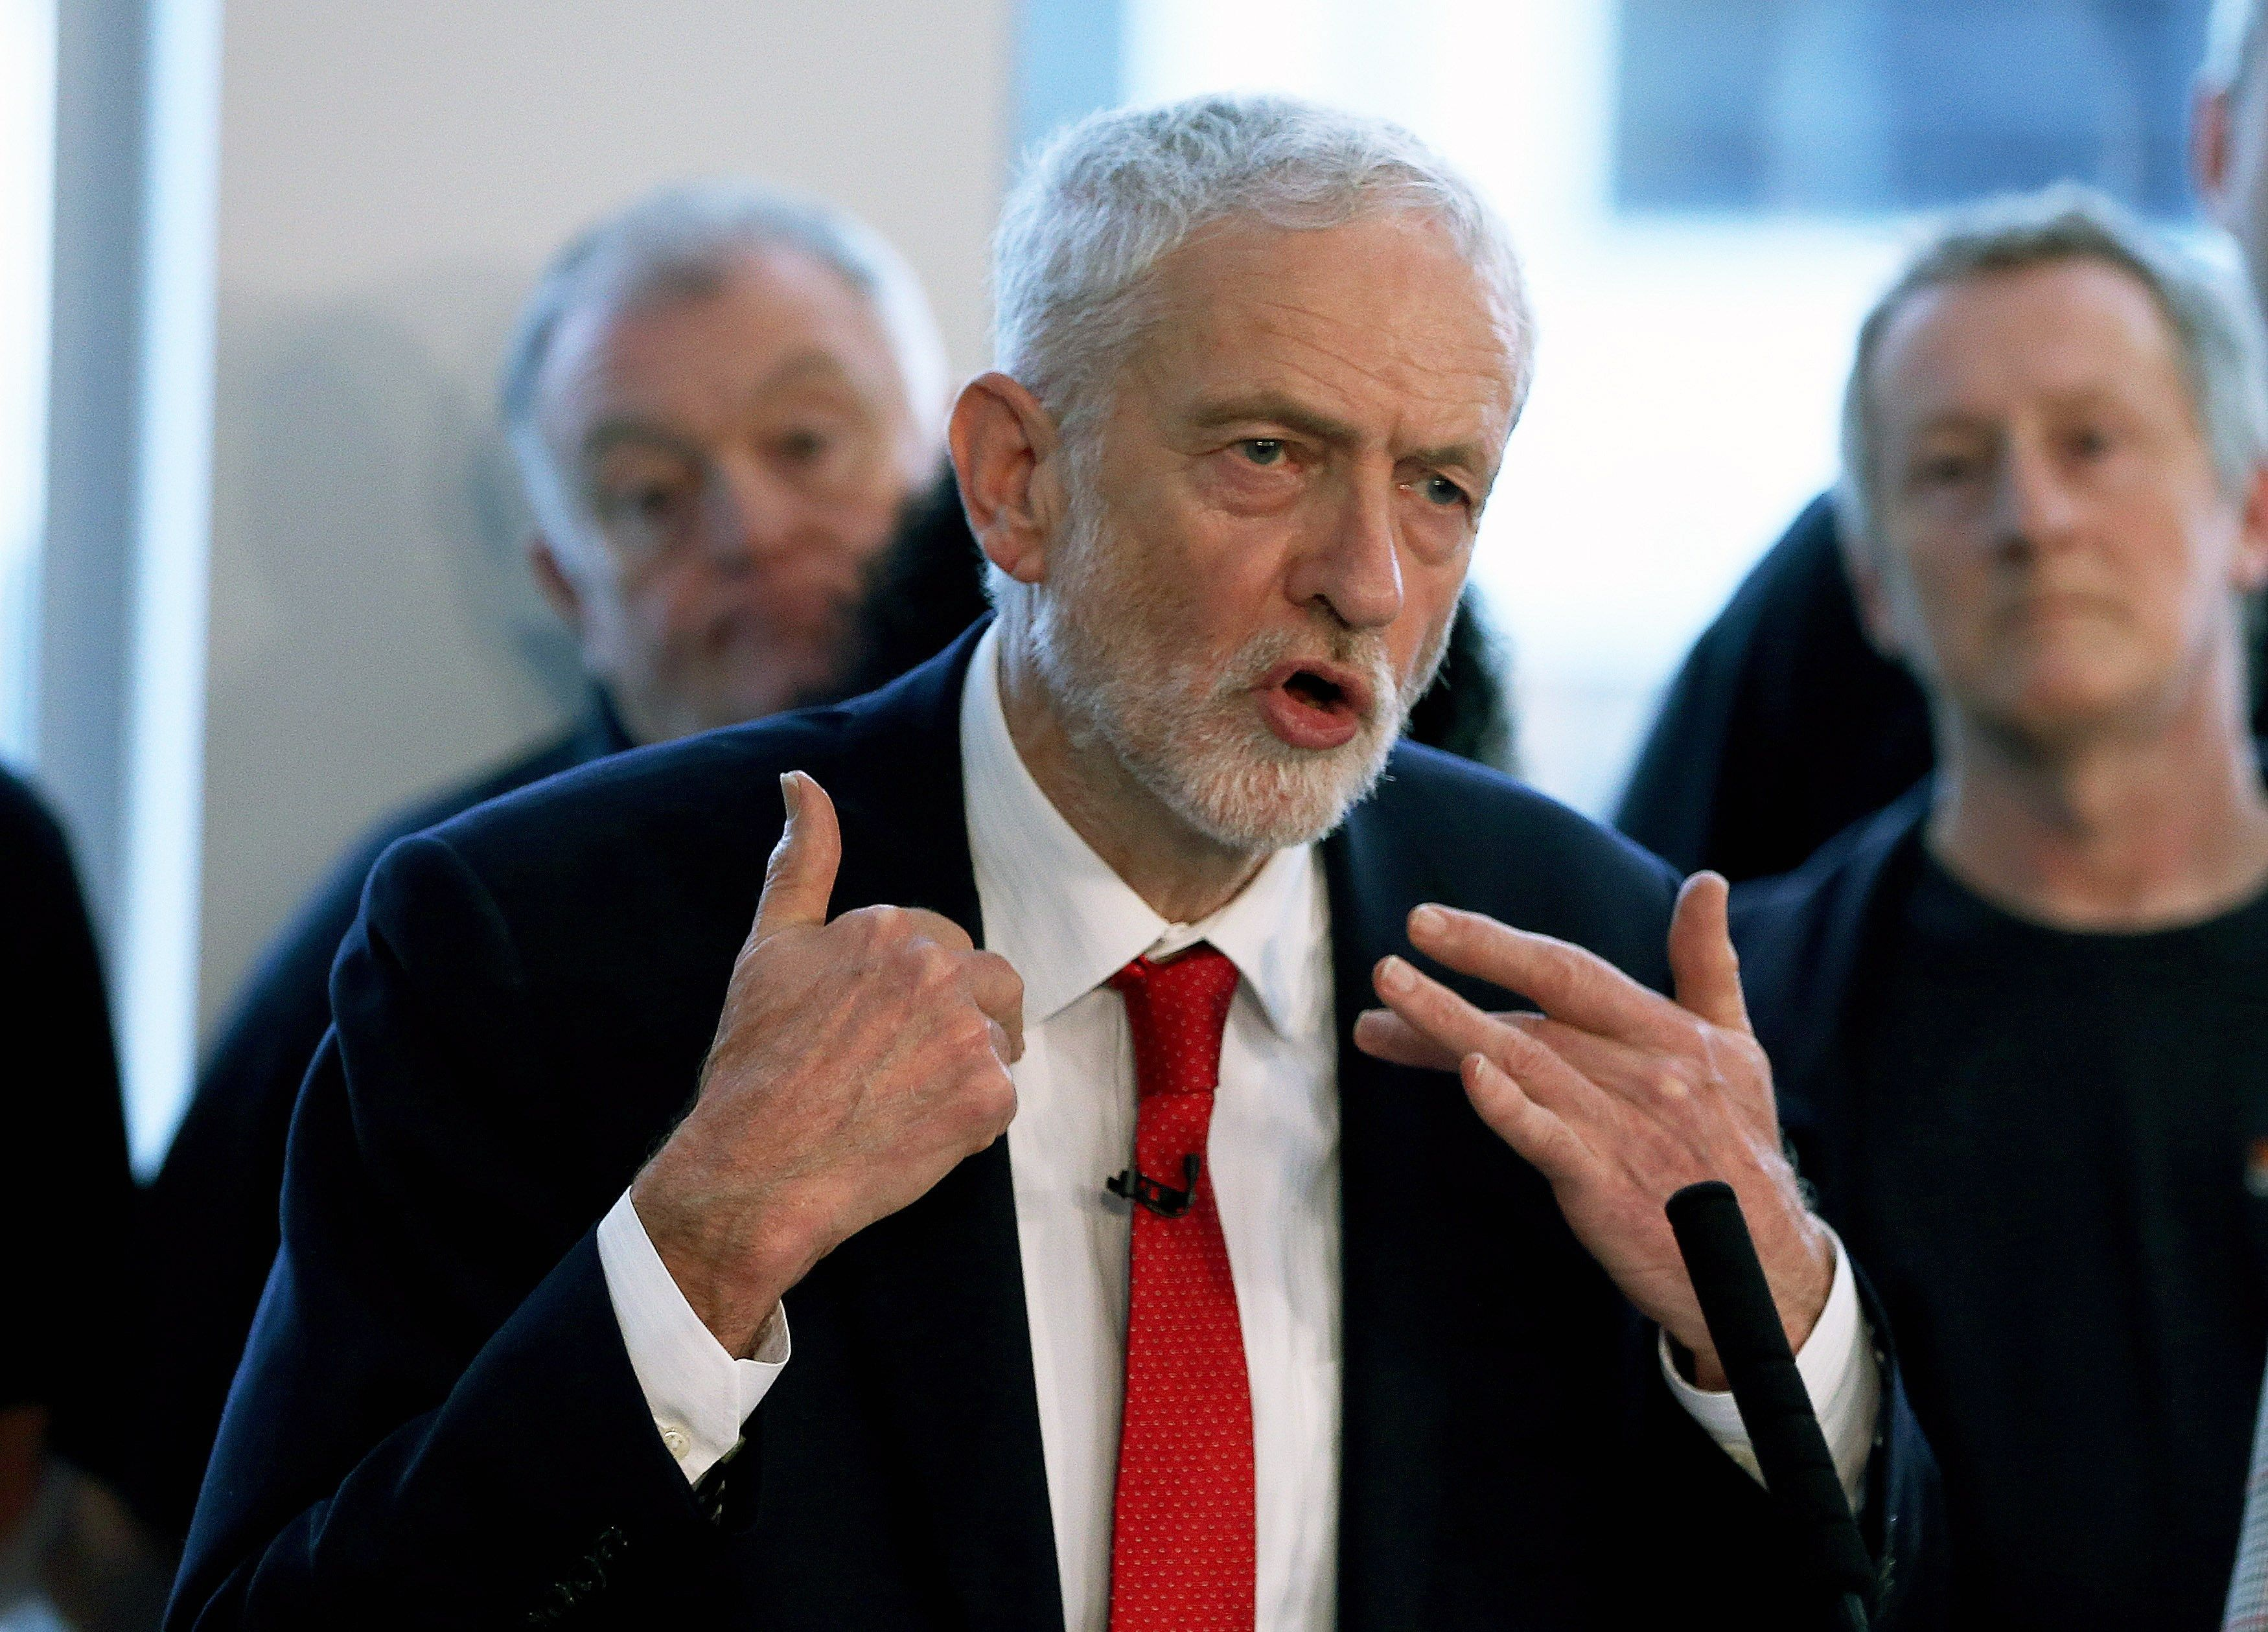 Líder oposició parlament britànic Jeremy Corbbyn - Efe